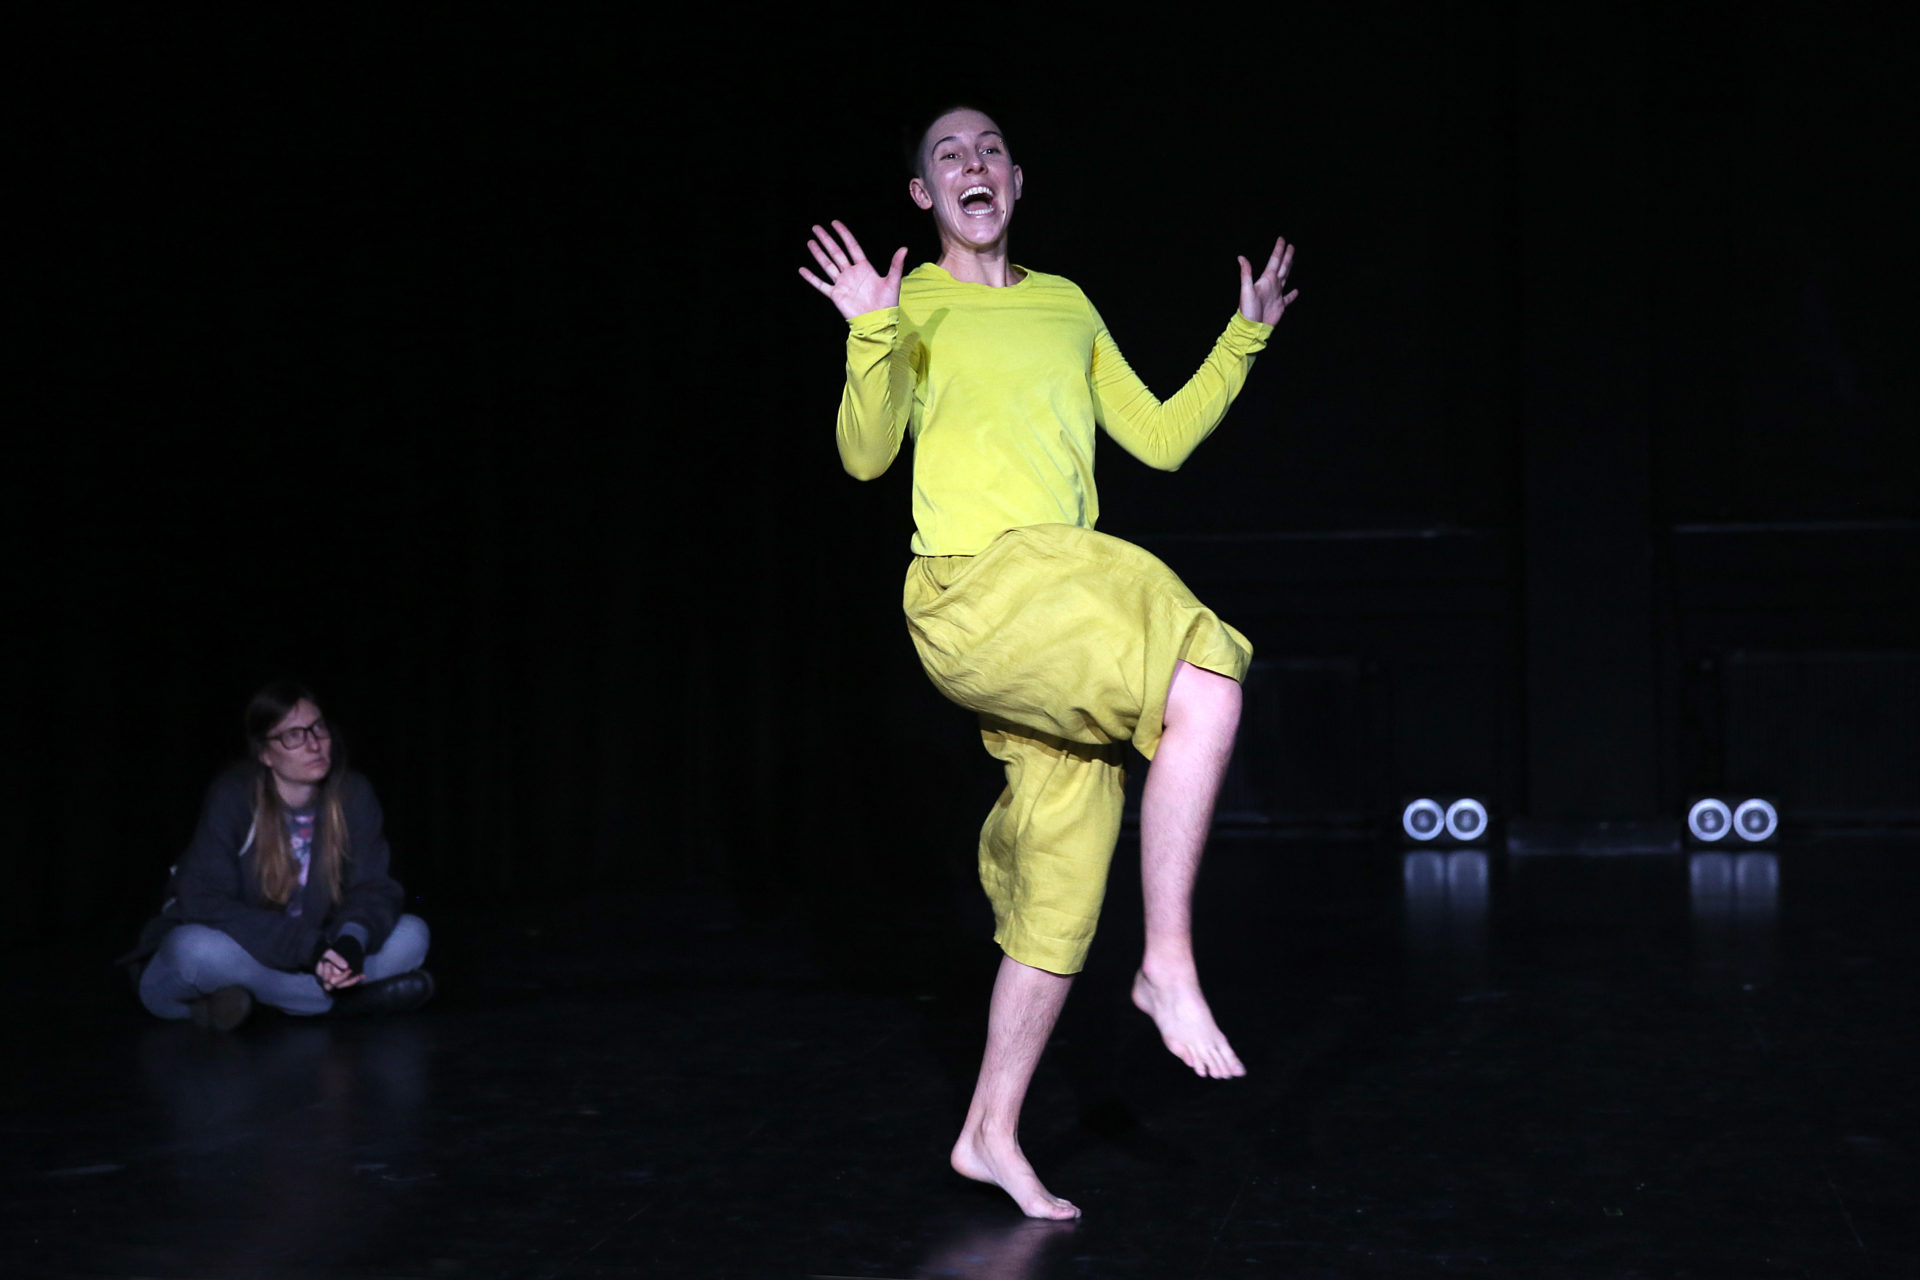 Dance_Forever_Fernanda_Ortiz_AnjaBeutler.de_376